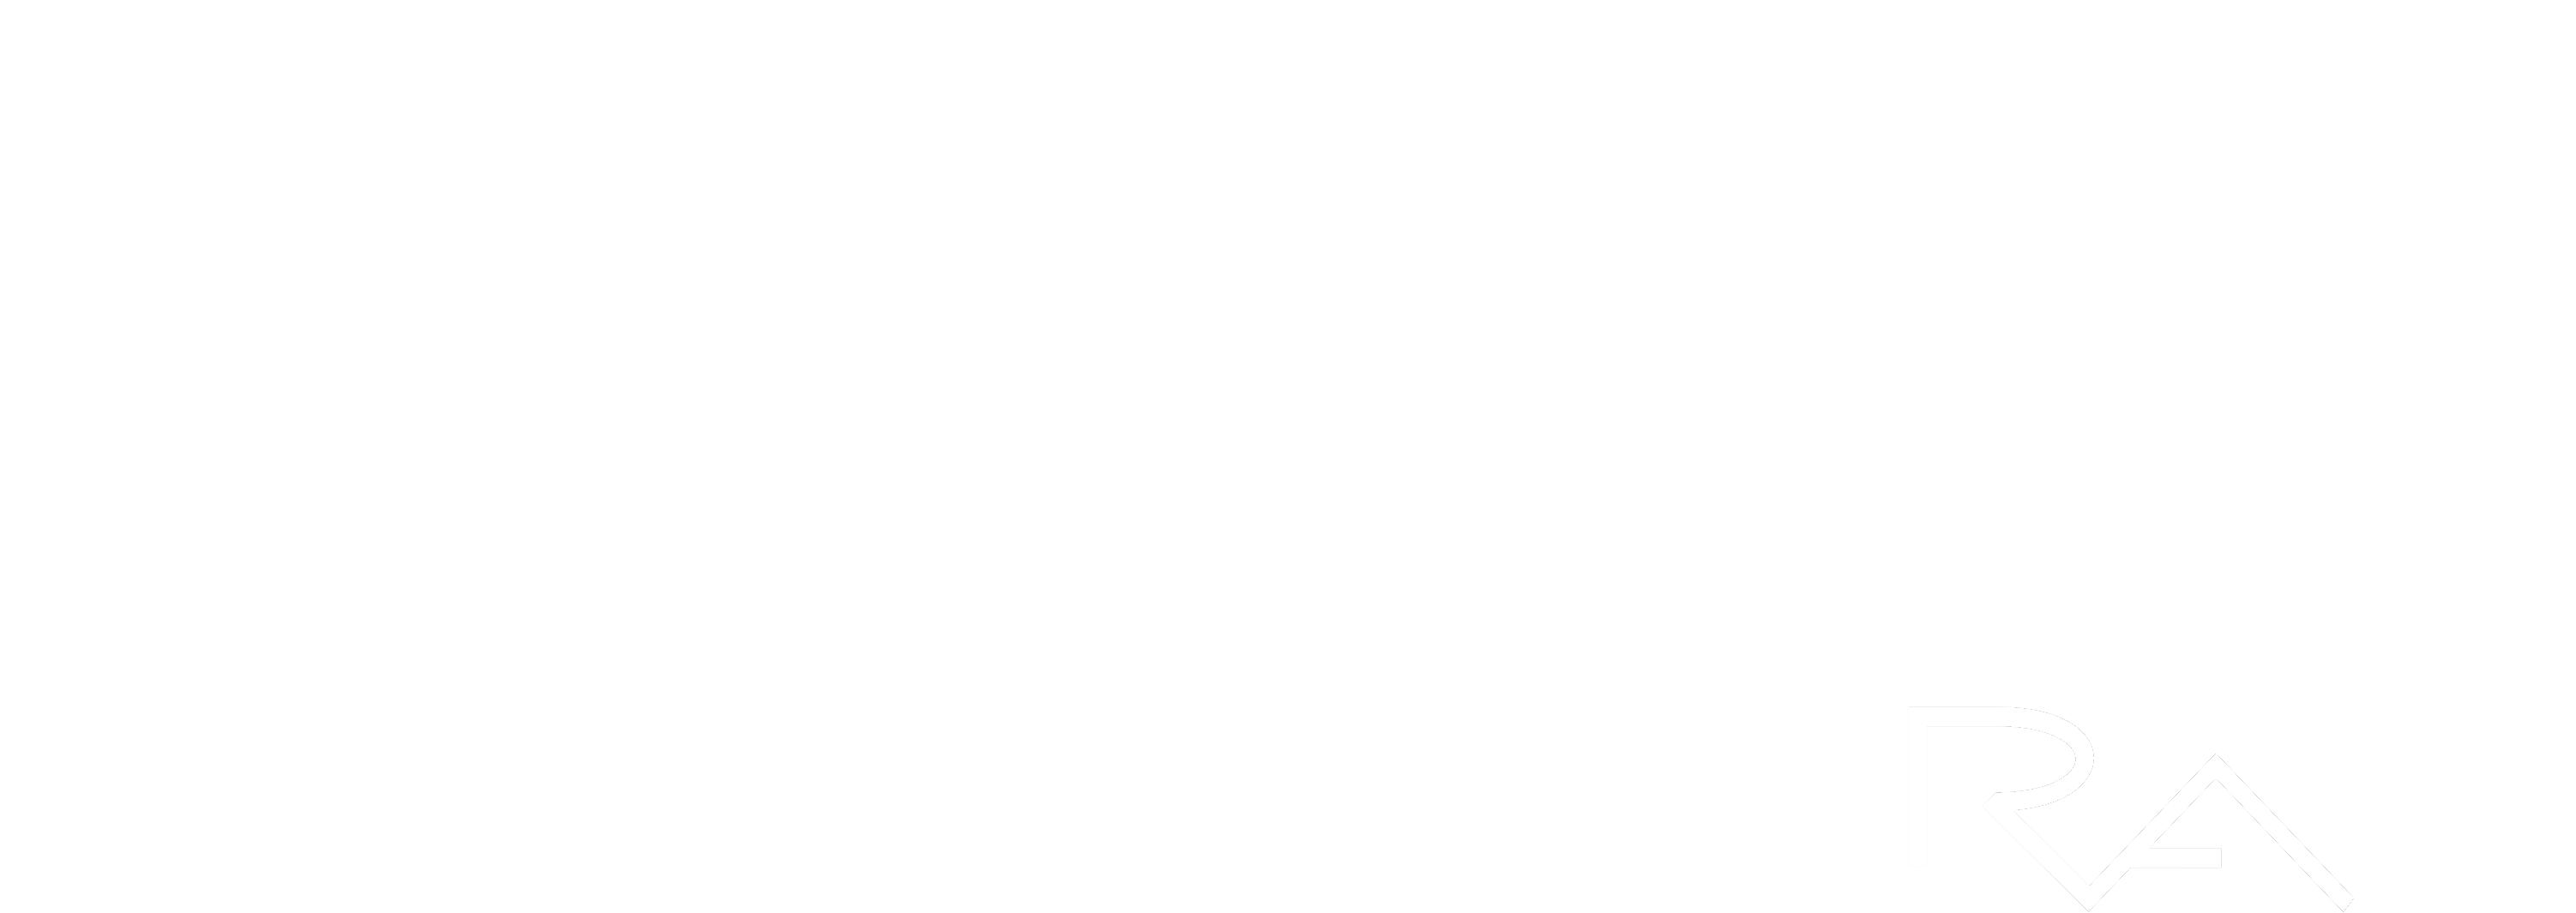 Zlatara Mitić